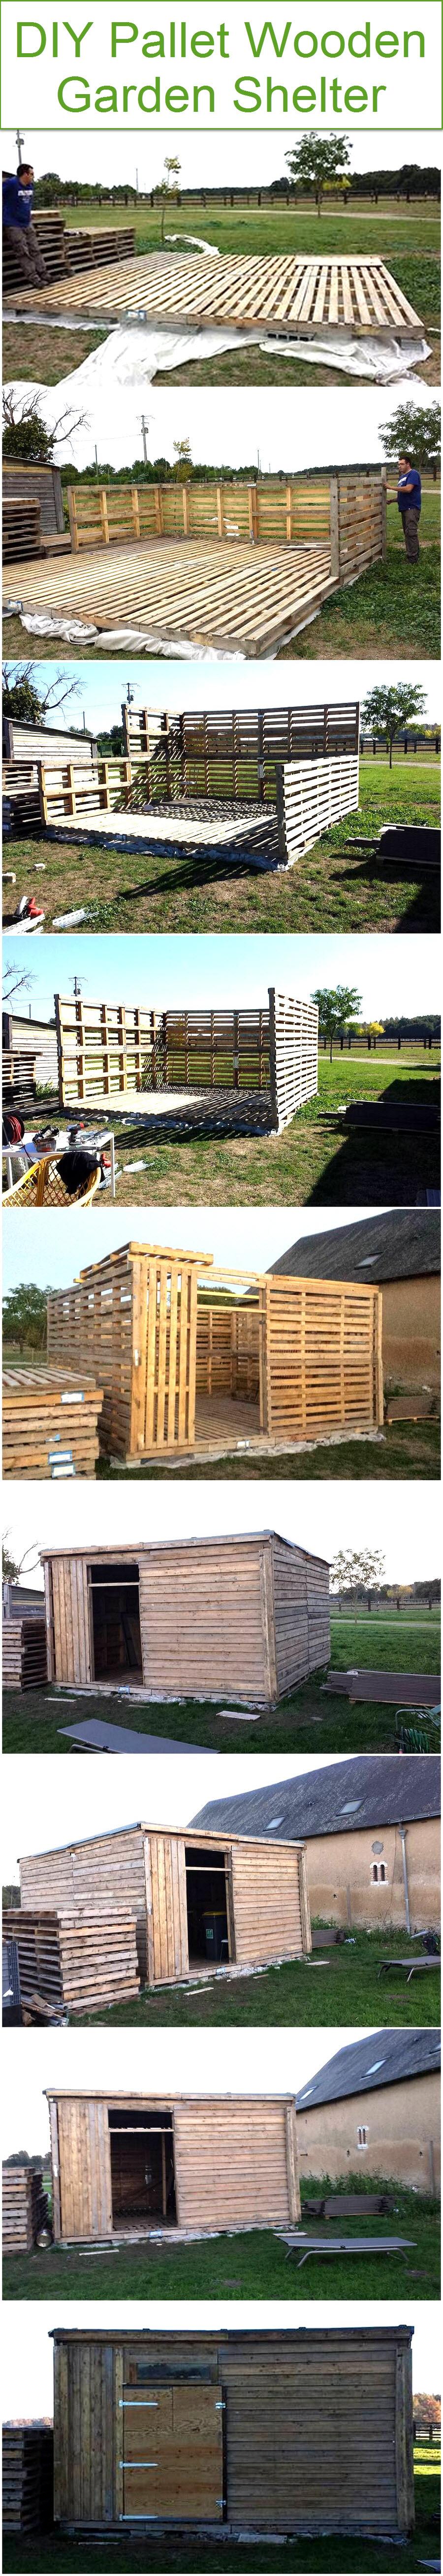 diy-pallet-wooden-garden-shelter